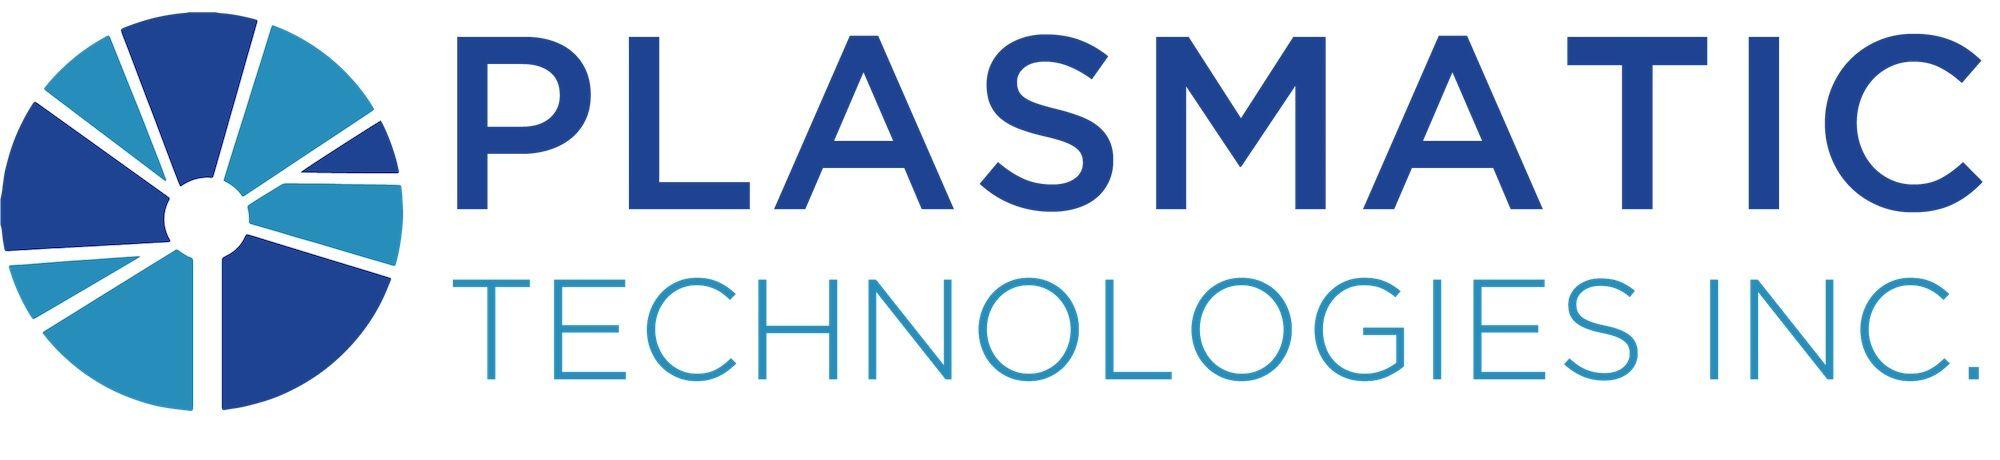 Plasmatic Technologies Logo